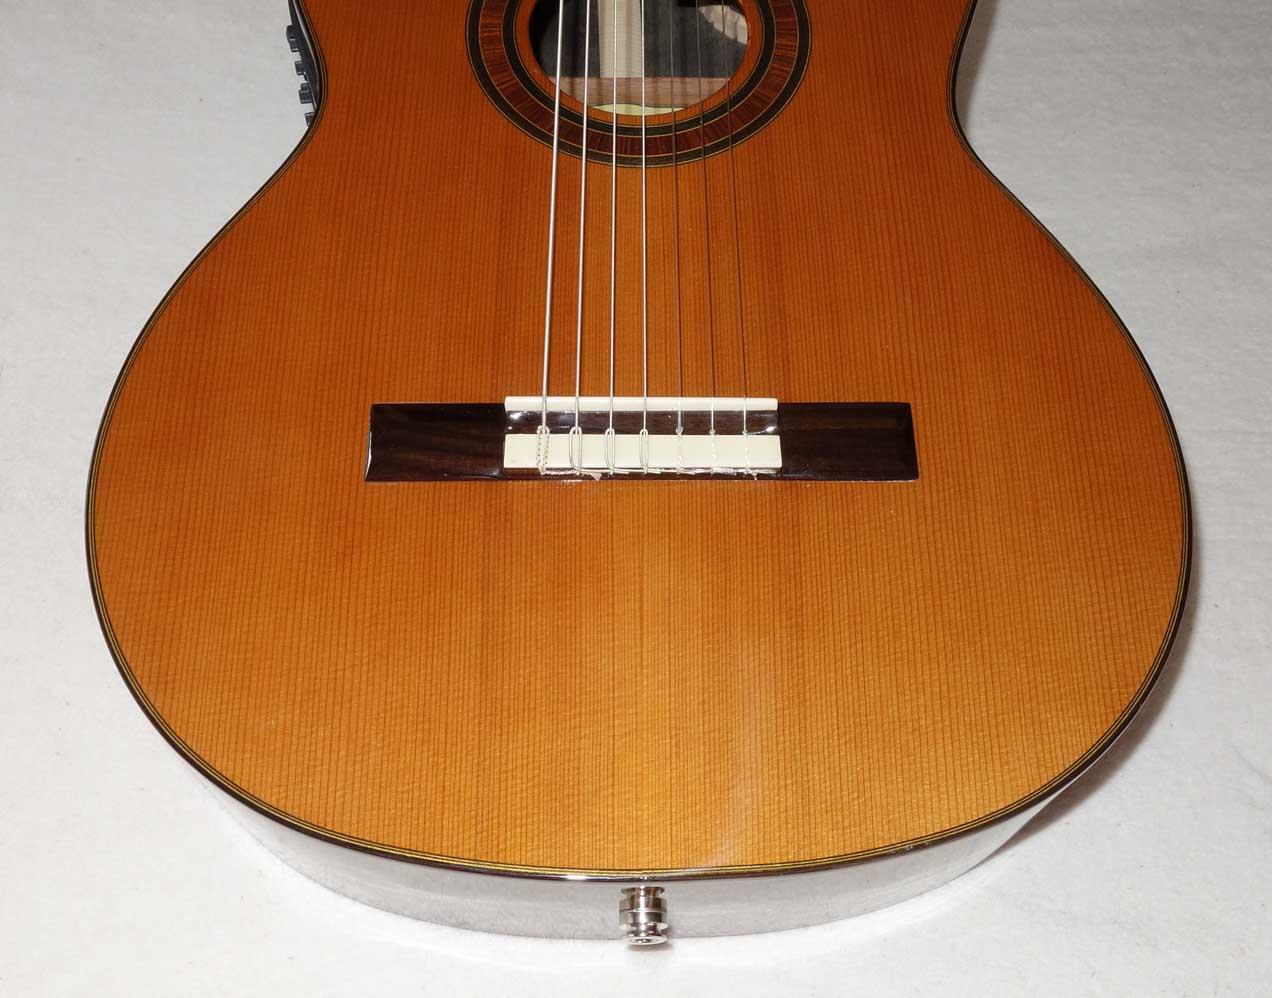 NEW Bartolex SRS7CEL 7-String Classical Harp Guitar, Fishman Presys Pickup, Cutaway, Hardshell Case